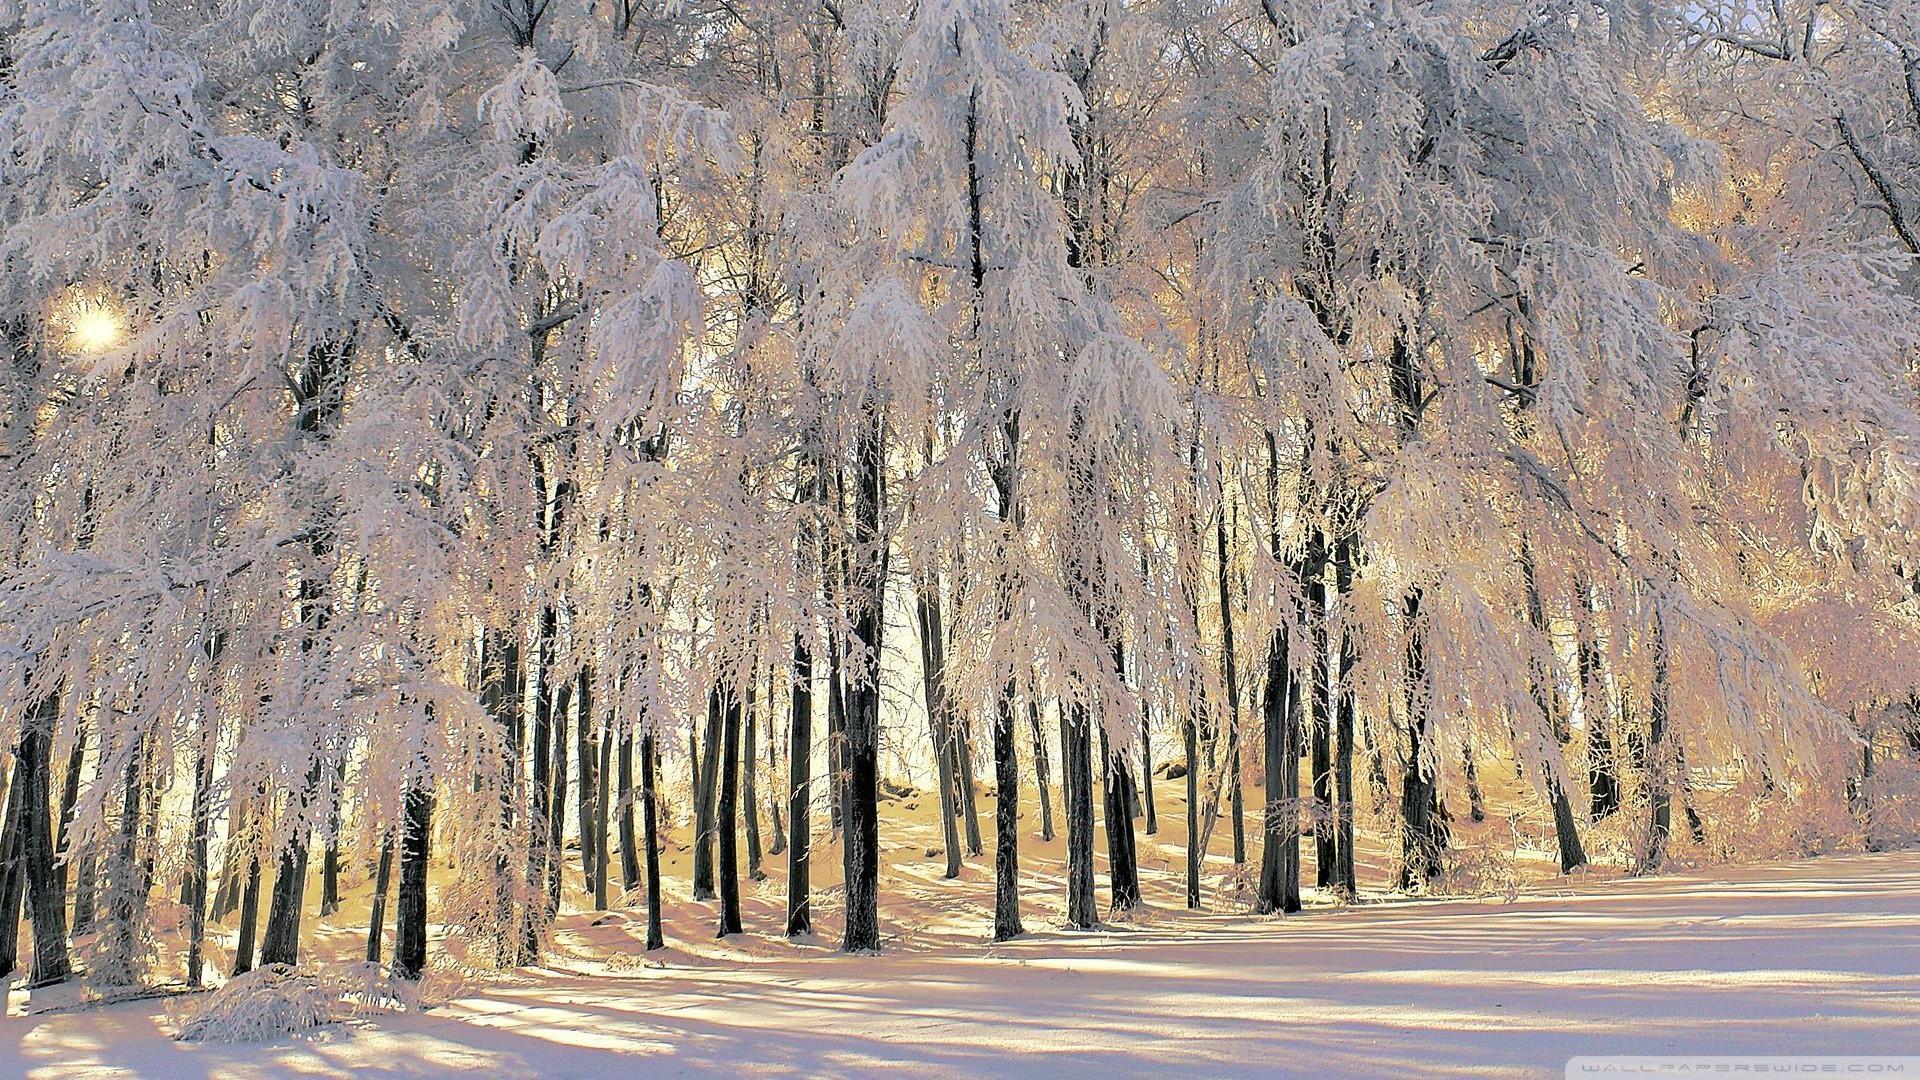 Winter Ice Lake Scenes Desktop Wallpaper | Wallpapers | Pinterest | Winter  scenes, Scene and Wallpaper